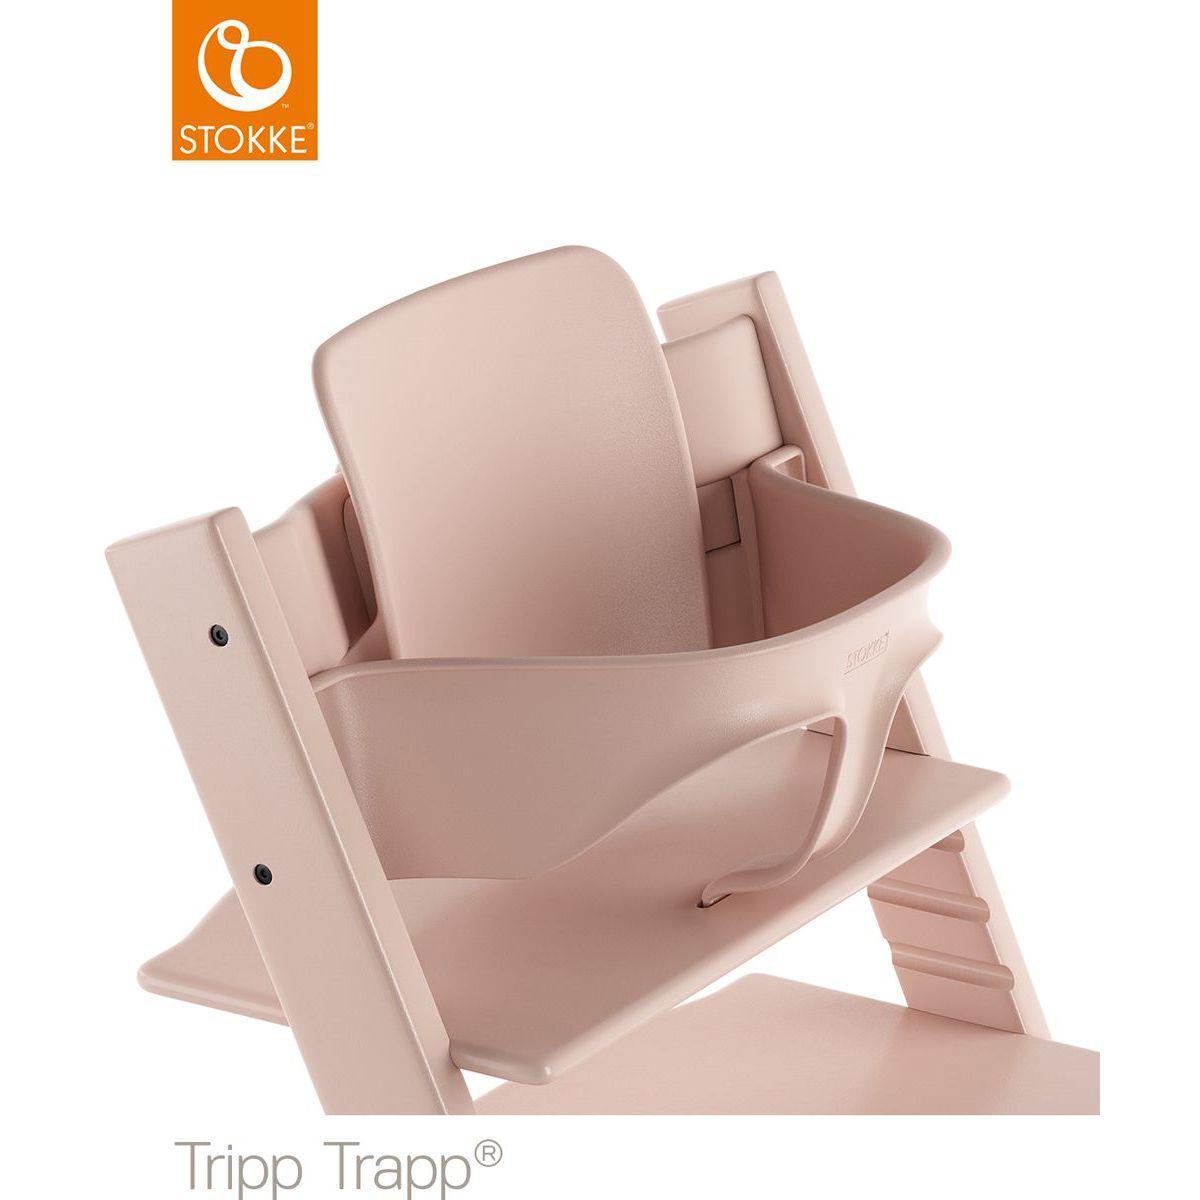 Baby set chaise haute TRIPP TRAPP Stokke rose serein